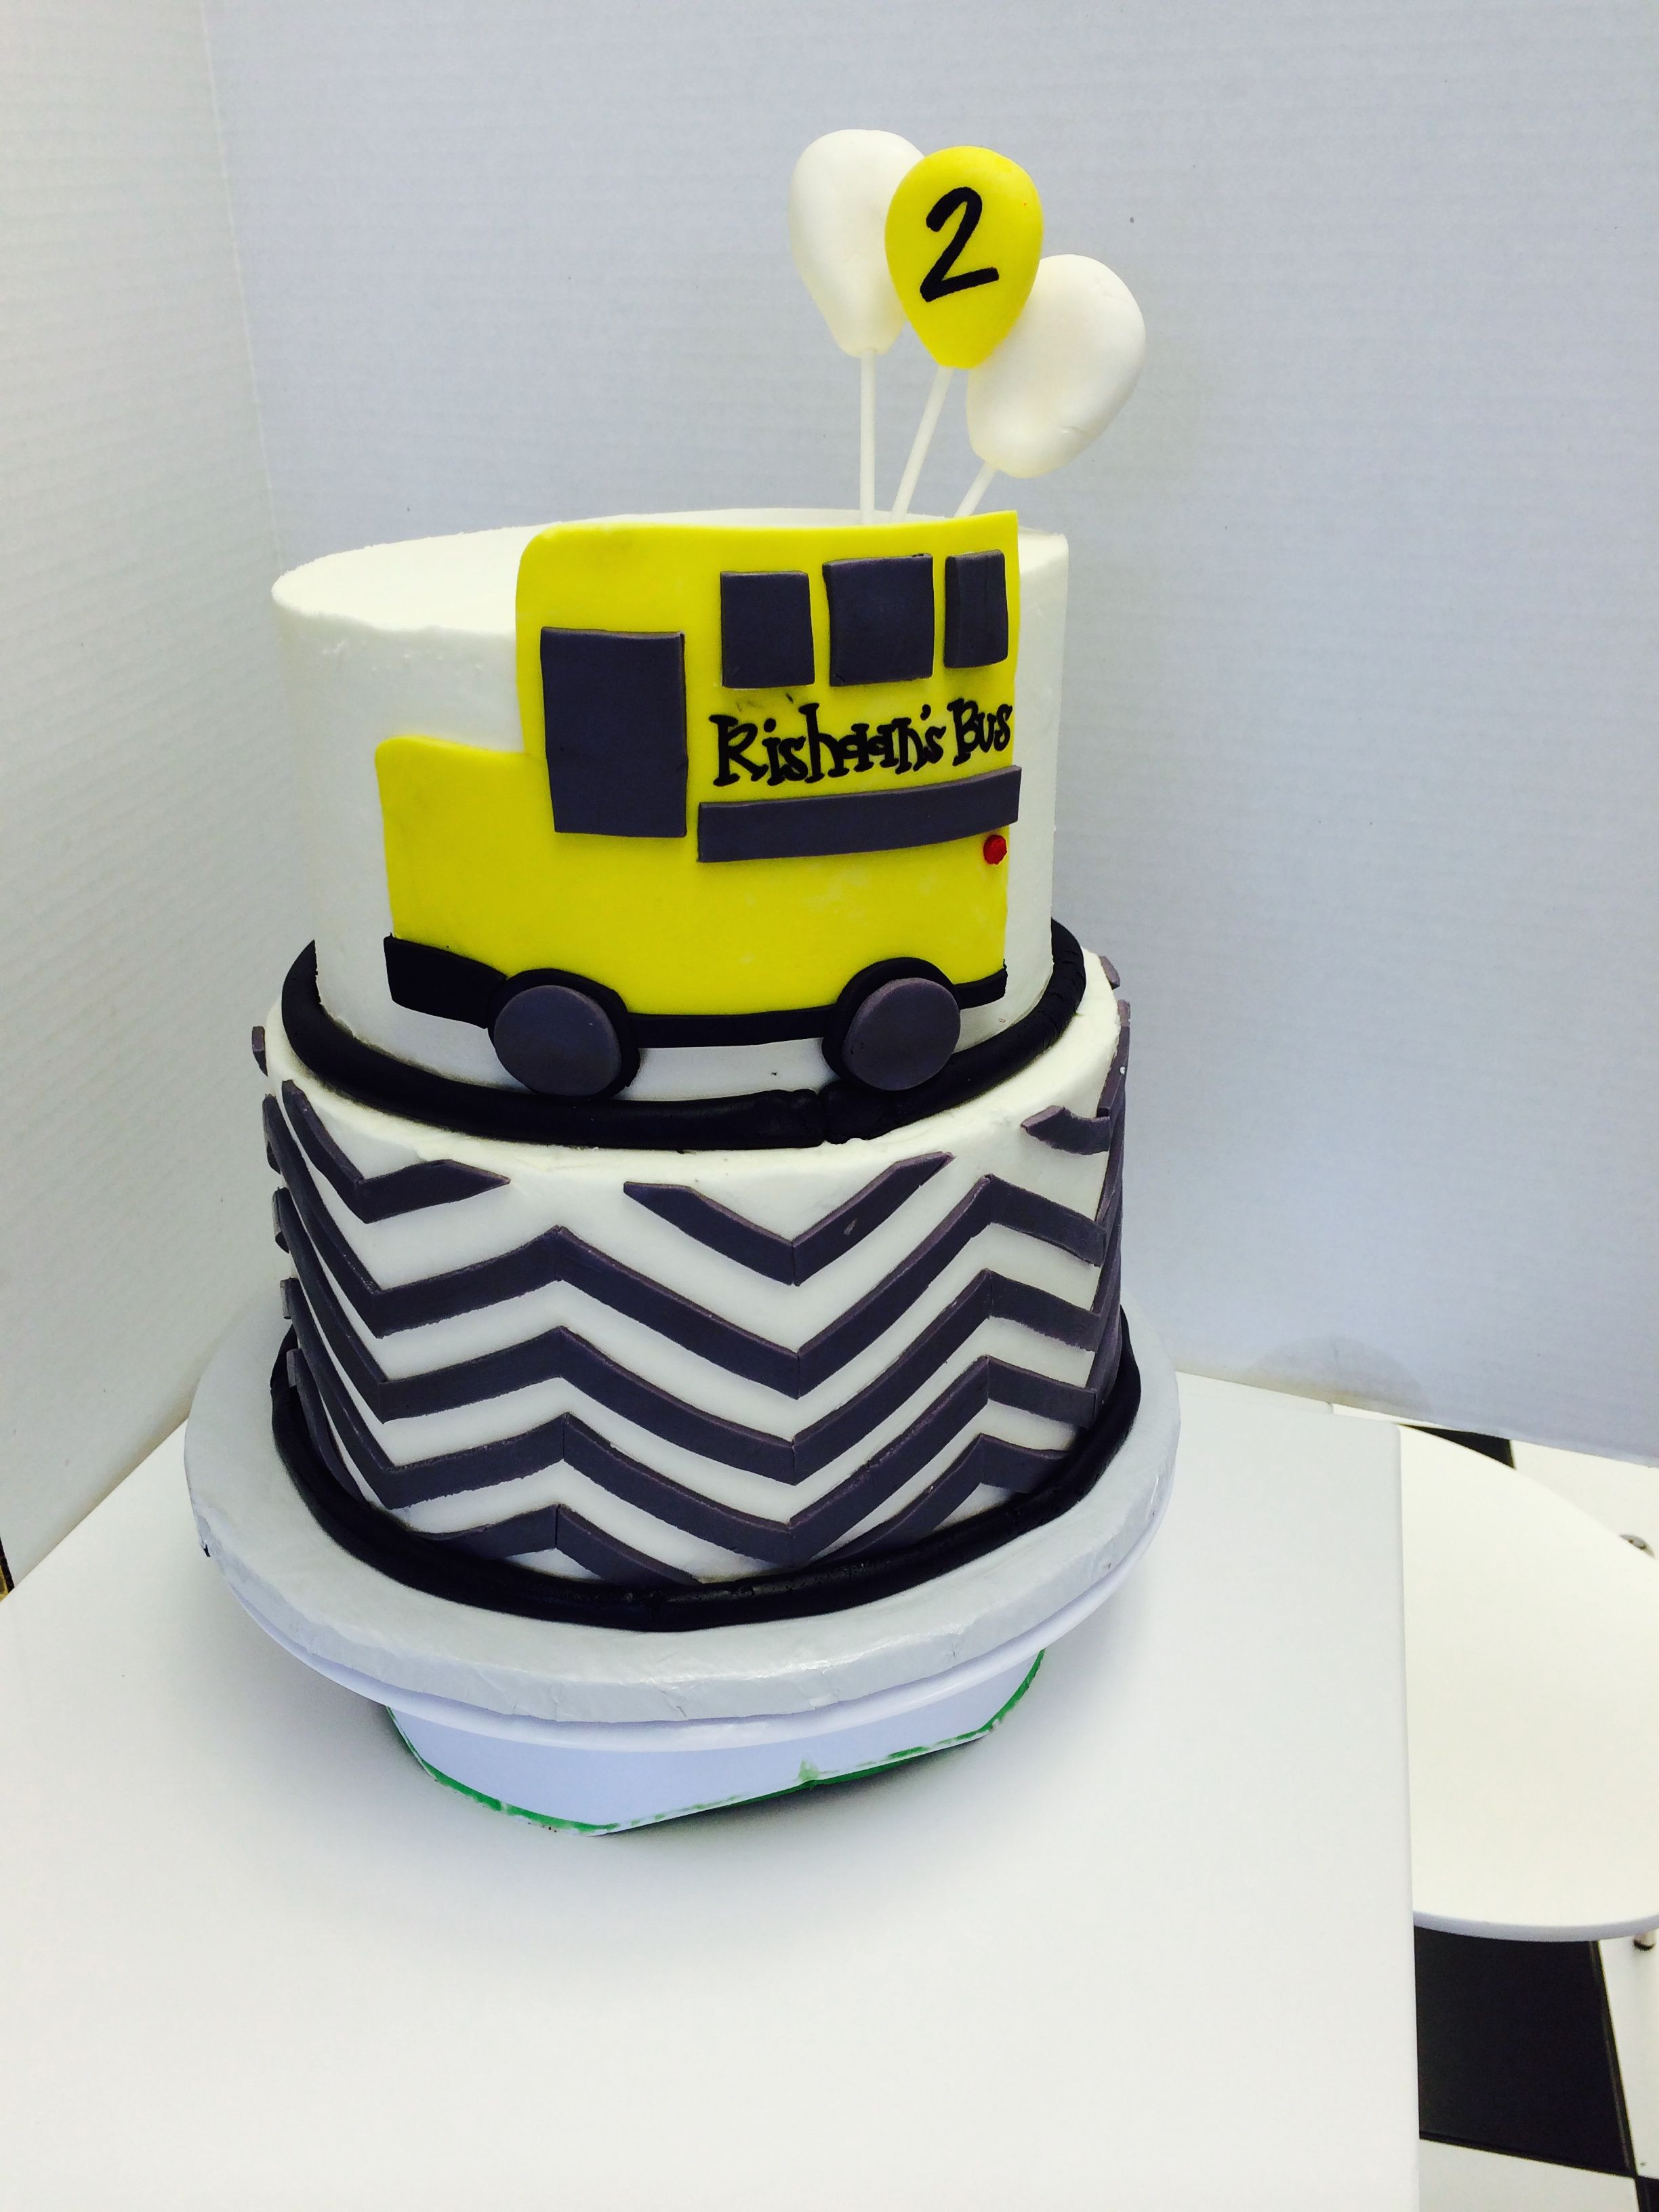 Chevron And School Bus Birthday Cake By Les Amis Bake Shoppe Baton